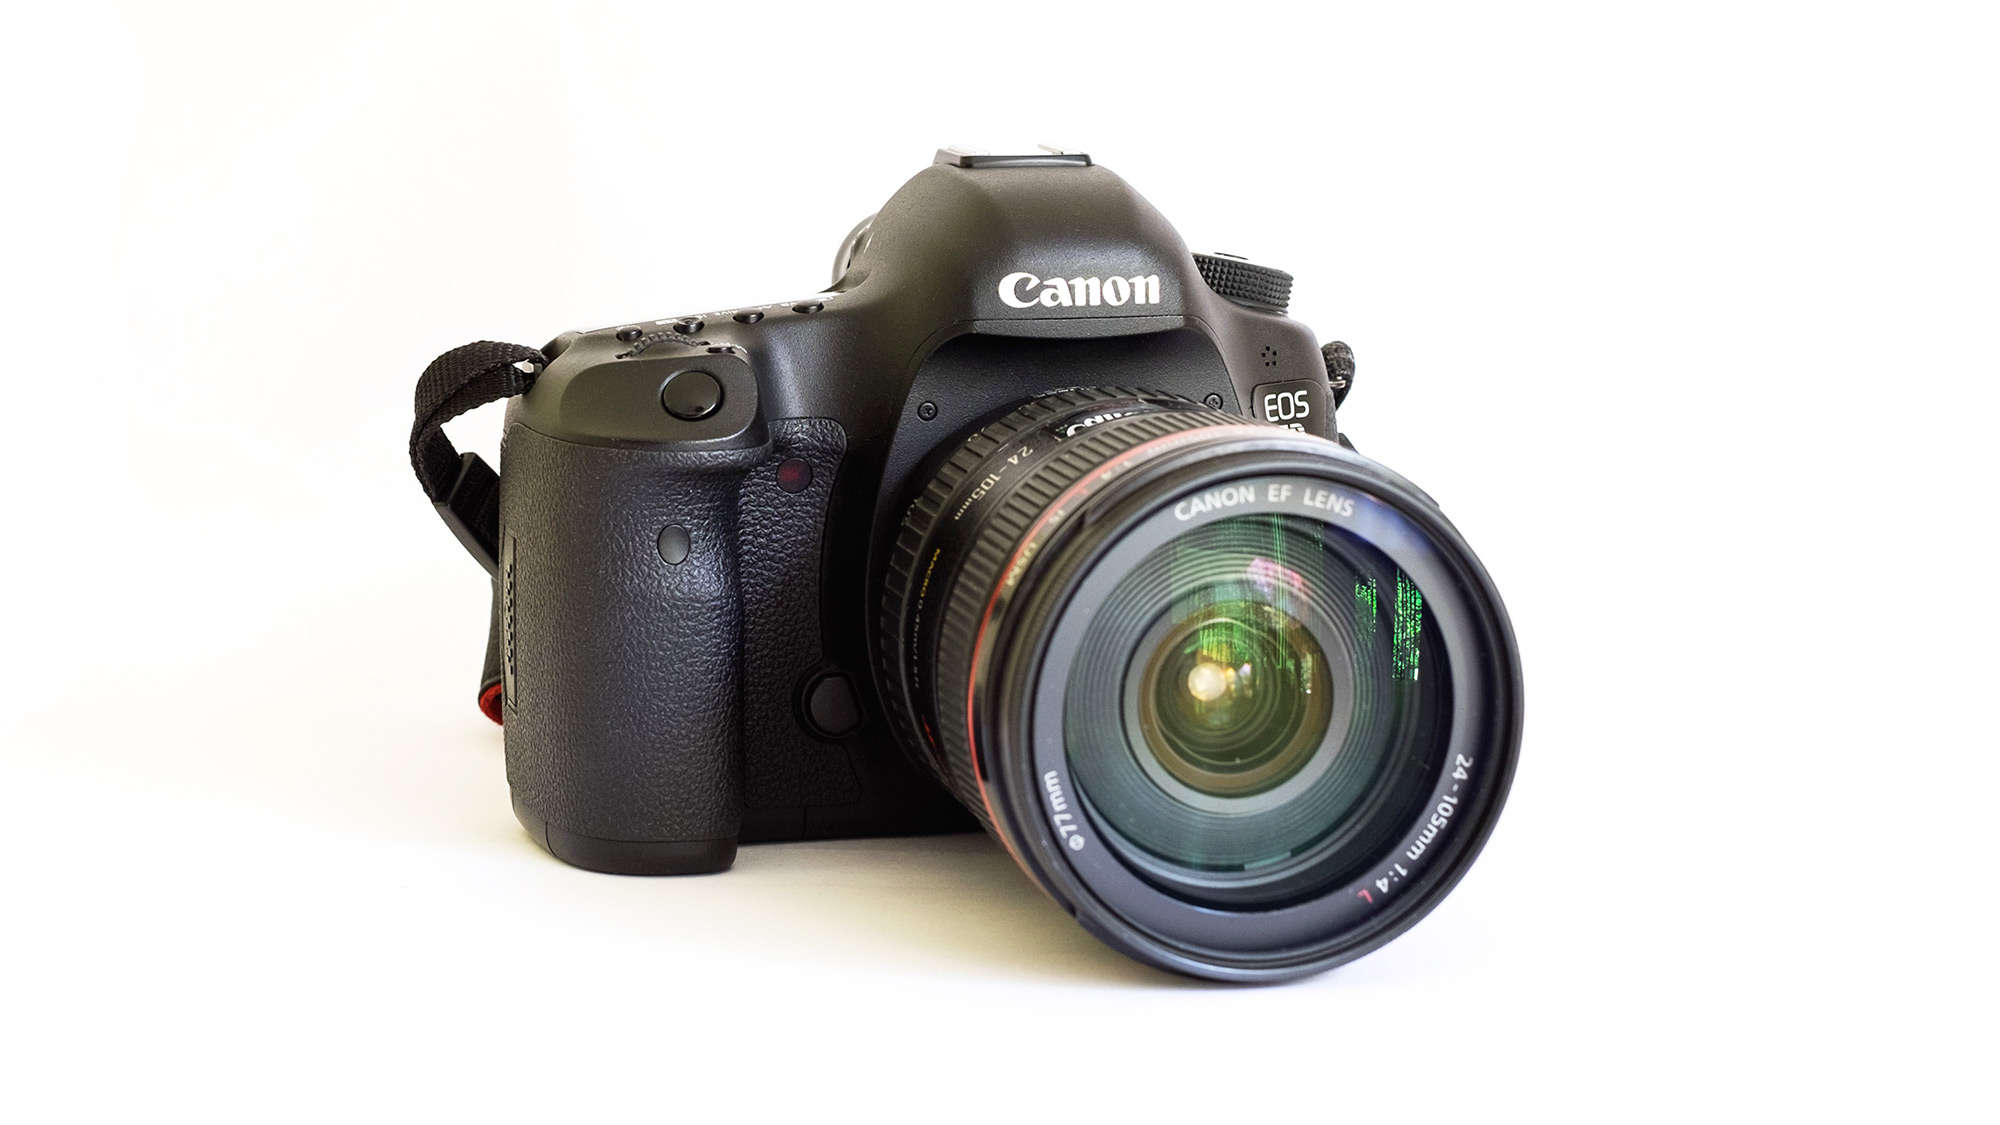 Canon 5D Mark III Digital SLR